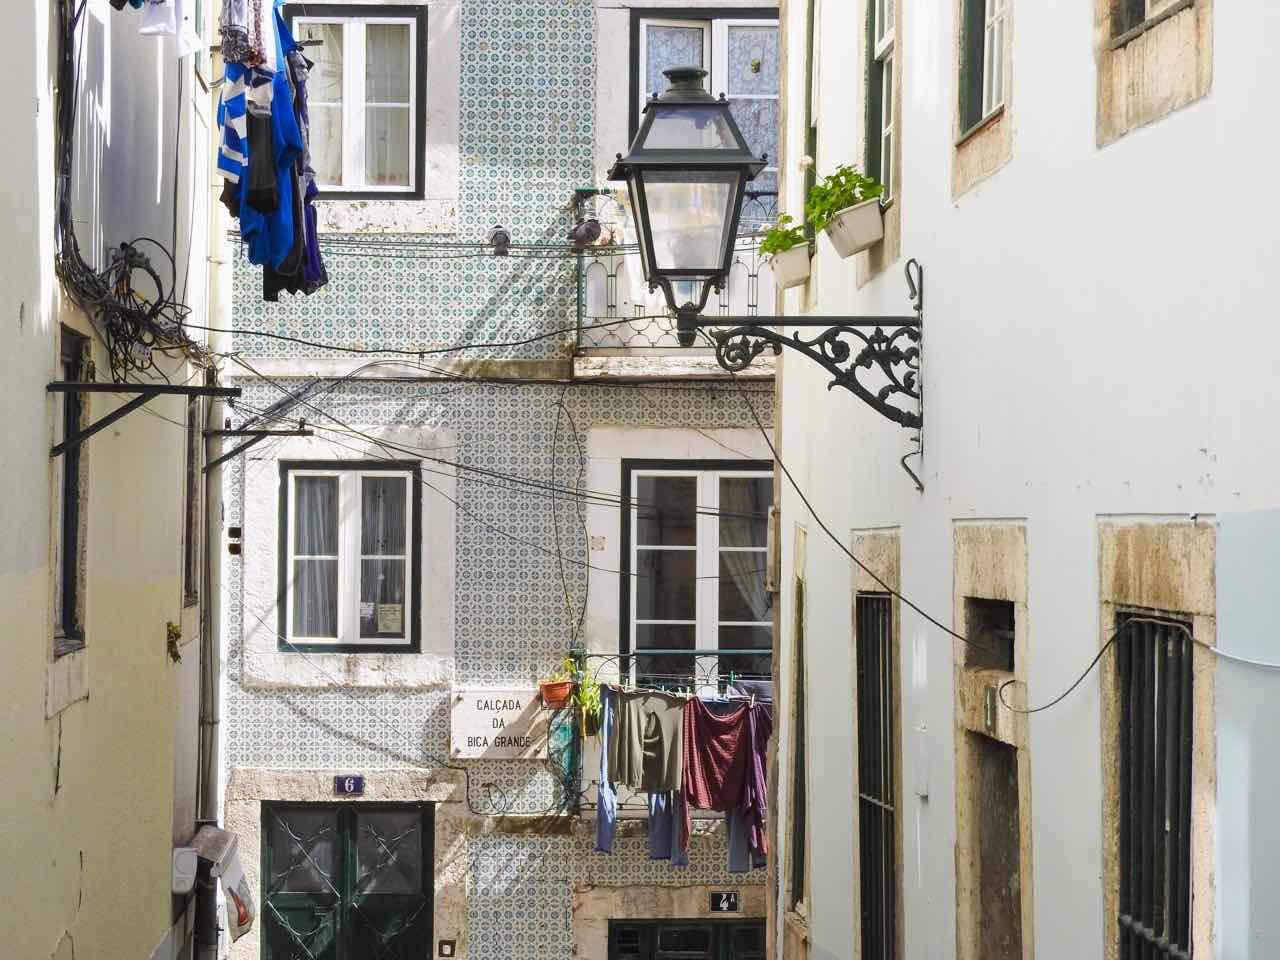 lisbon travel blog guide bica hidden gem district